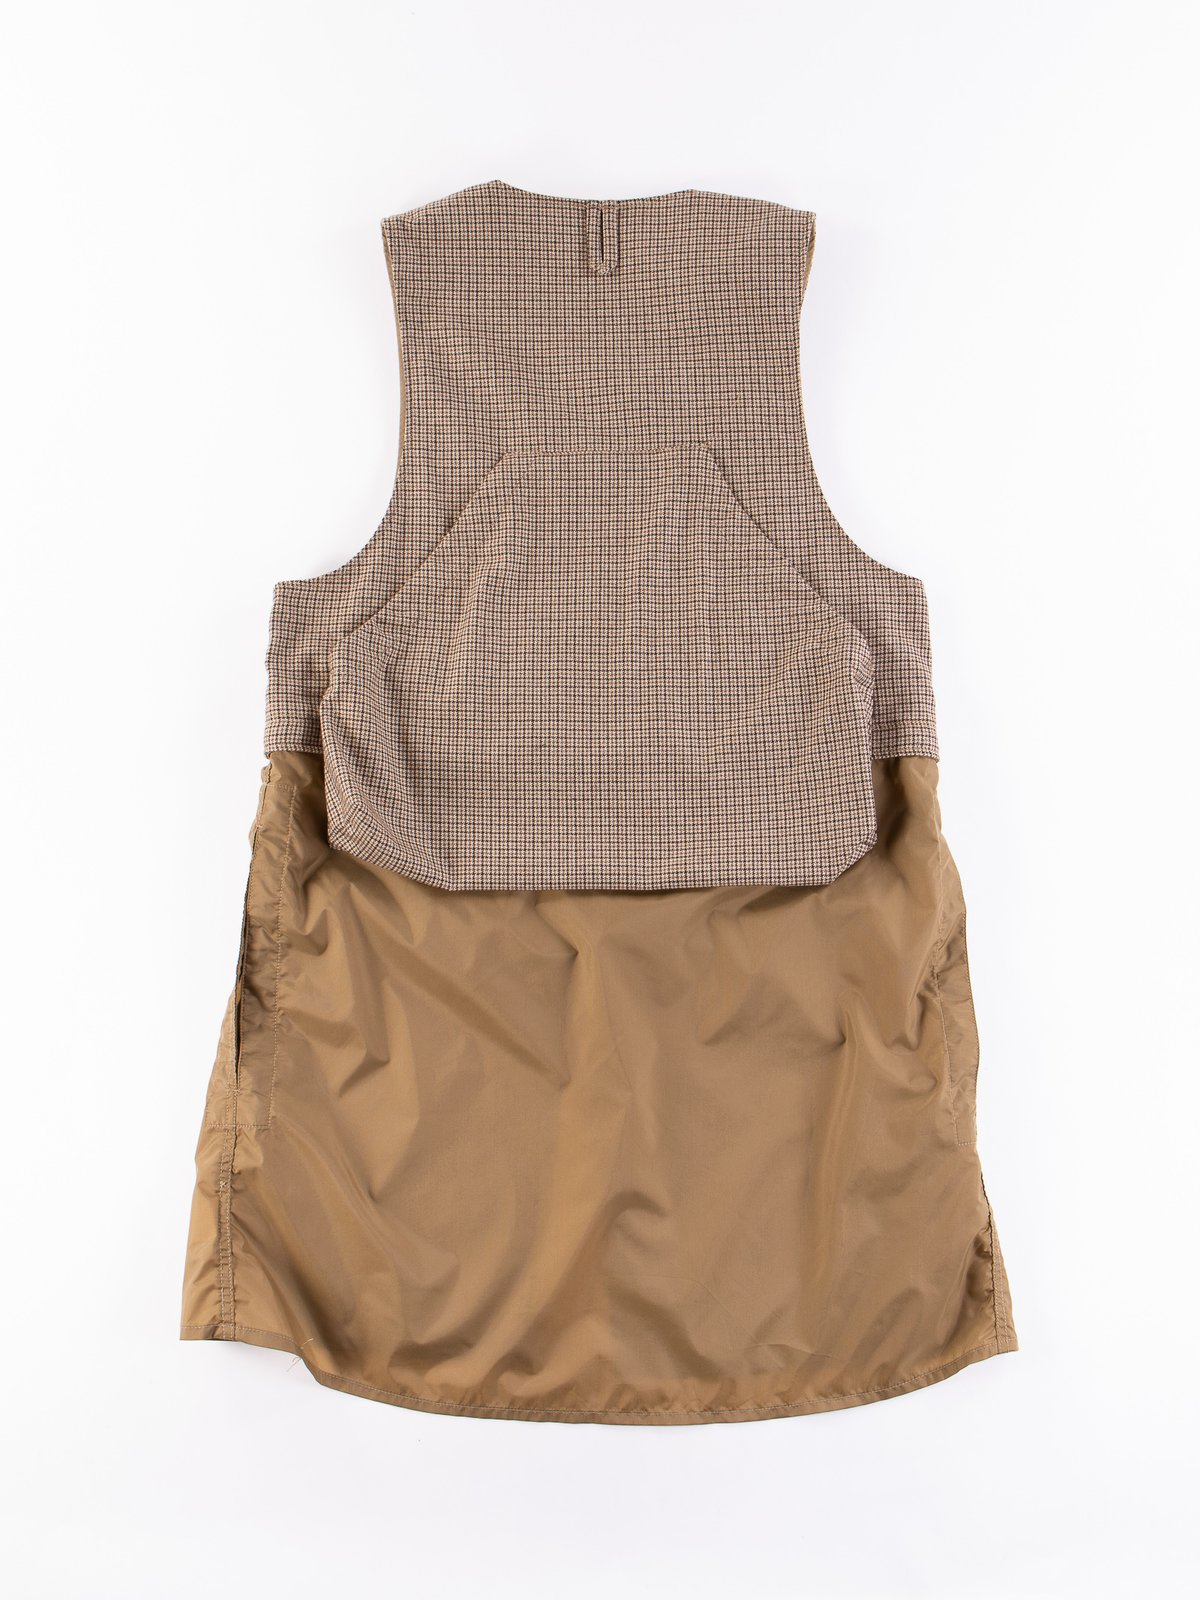 Brown Wool Poly Gunclub Check Long Fowl Vest - Image 7